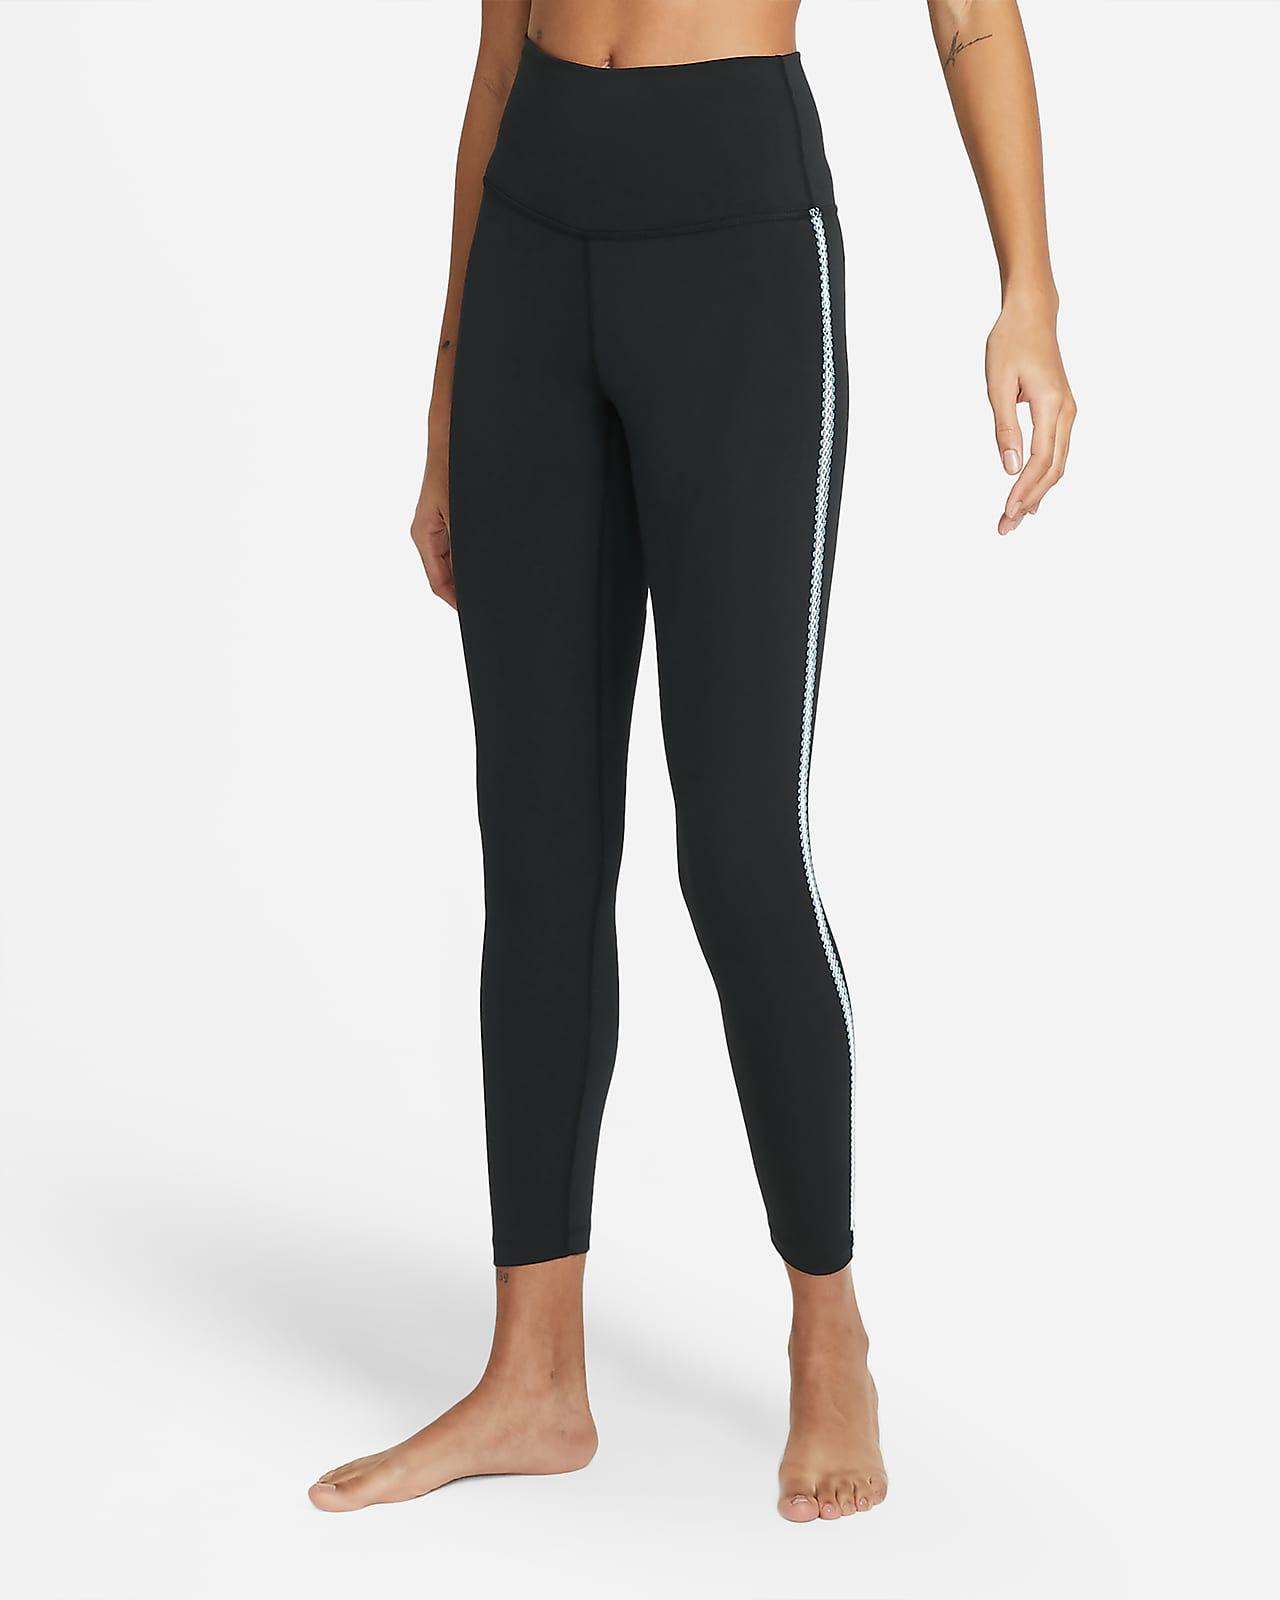 Leggings con orilla de encaje 7/8 para mujer Nike Yoga